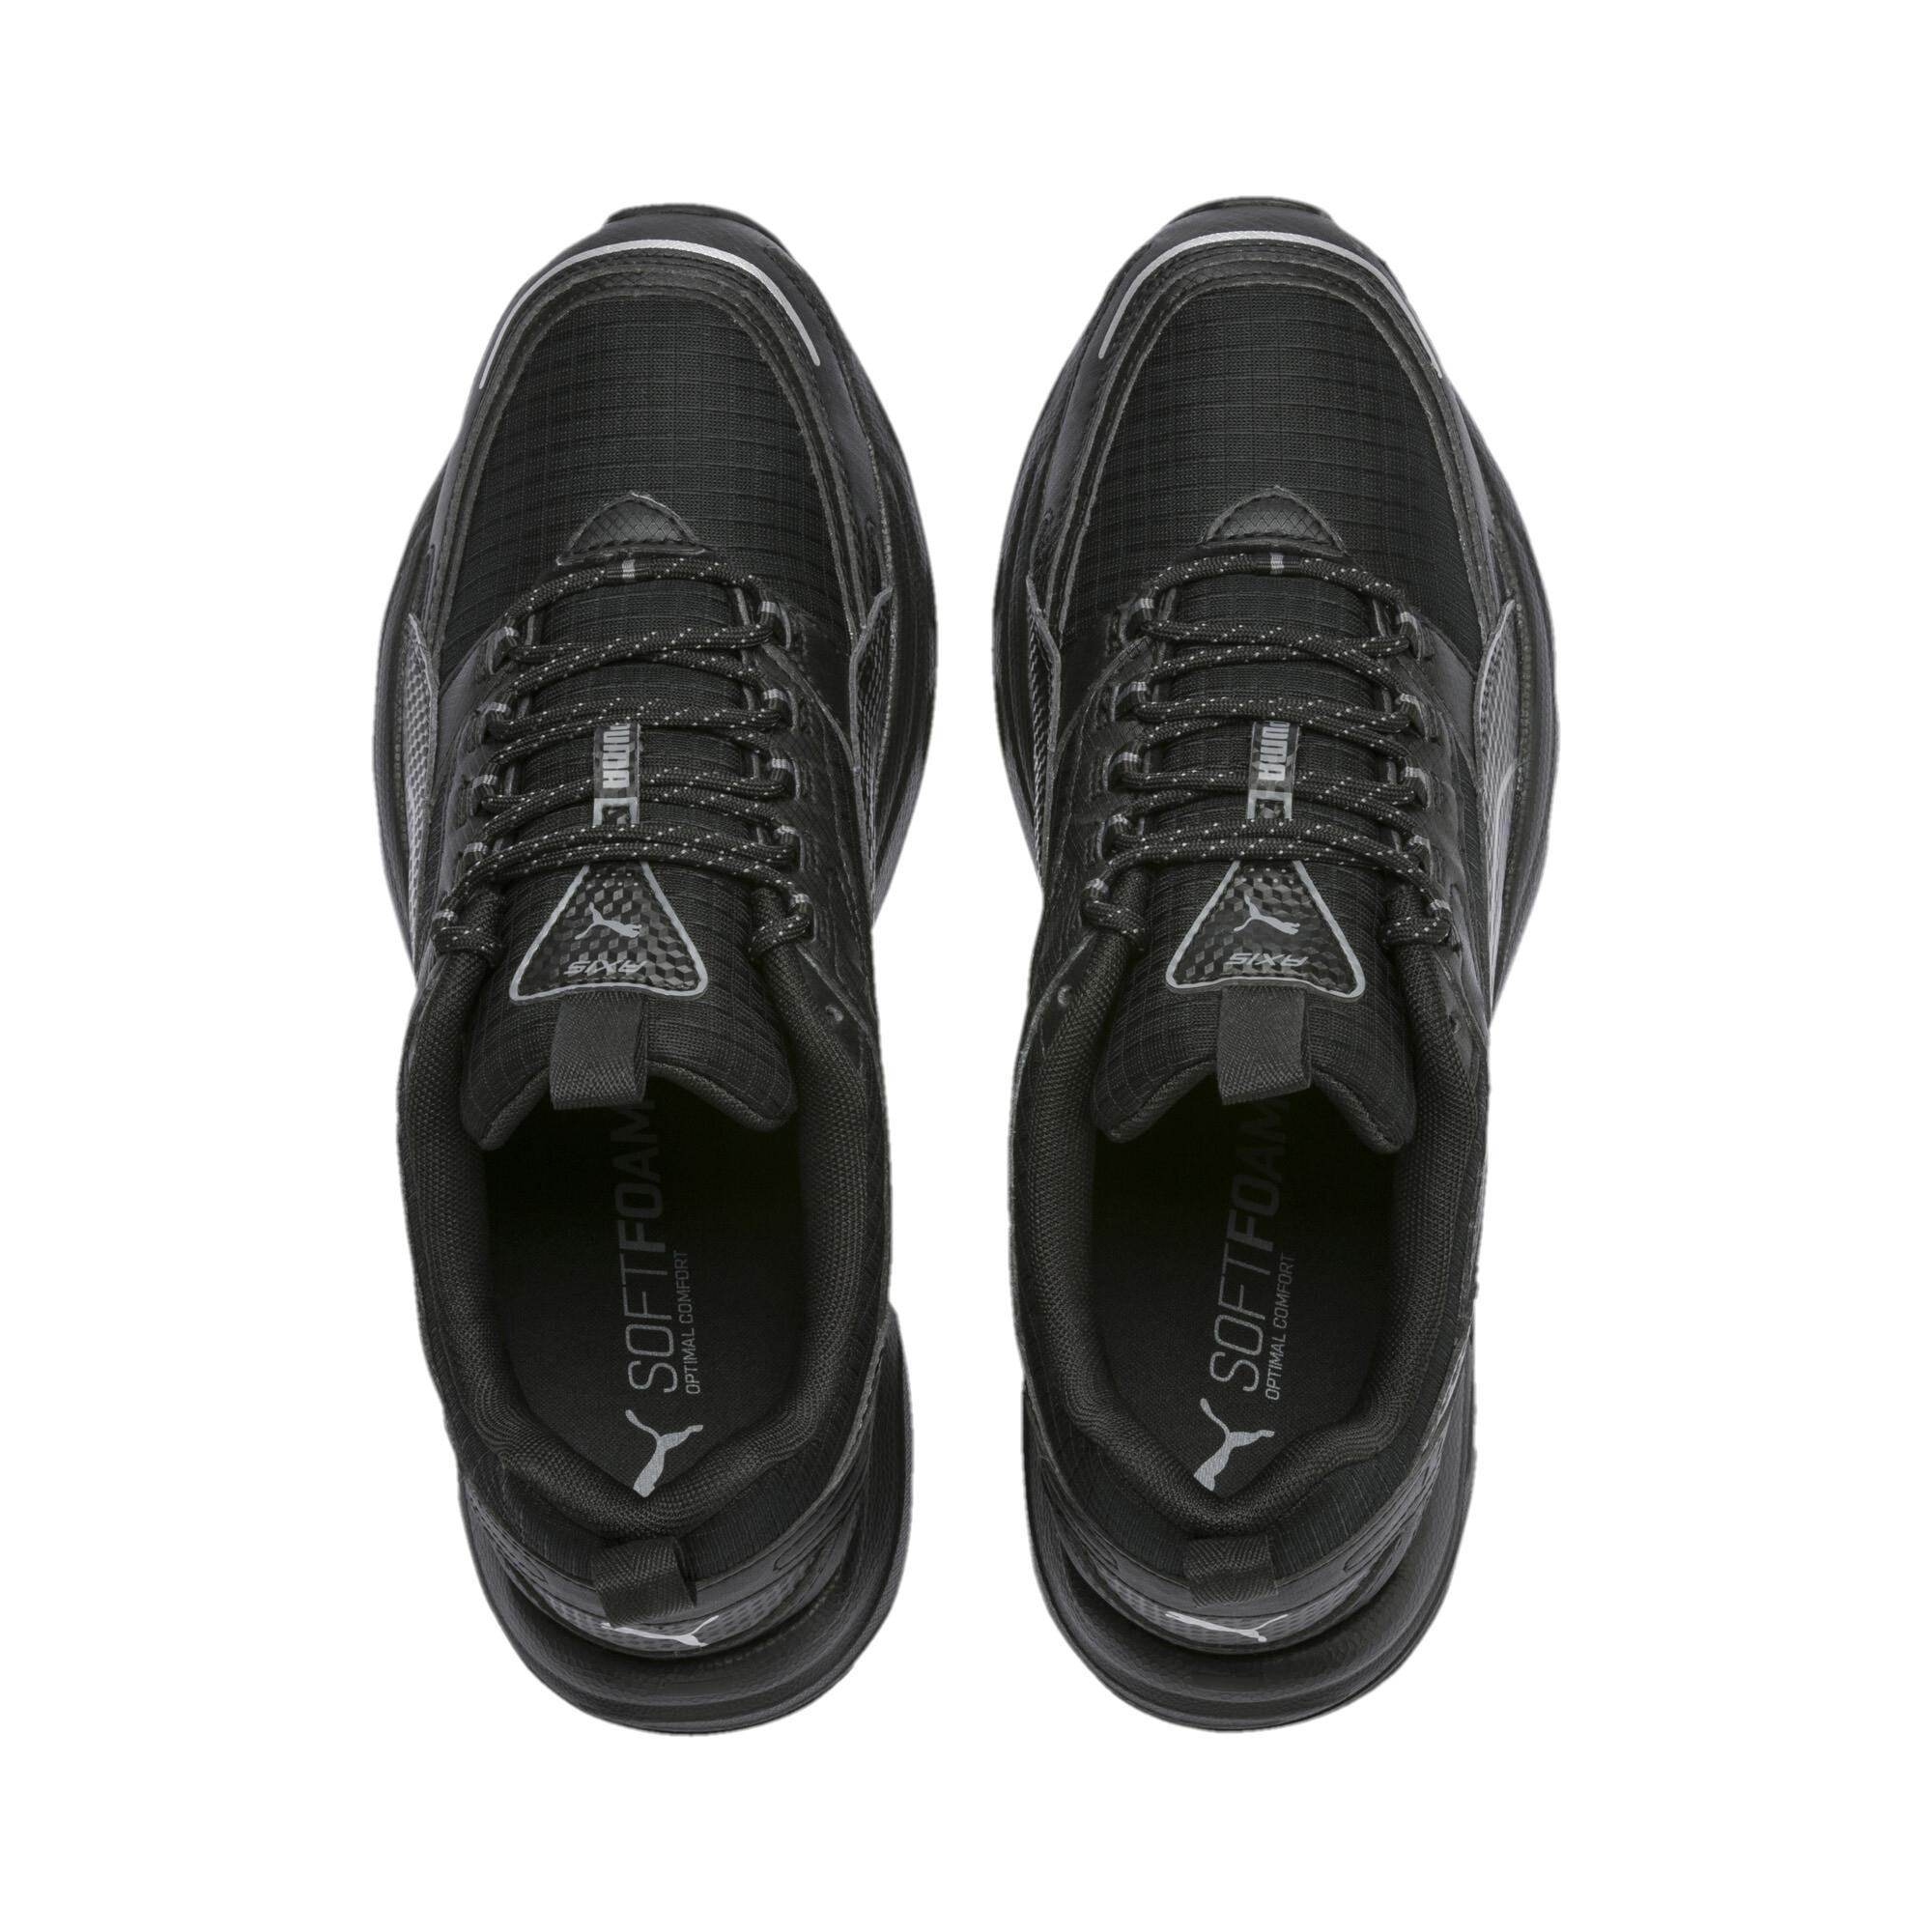 PUMA-Axis-Trail-Sneakers-Men-Shoe-Basics miniature 8